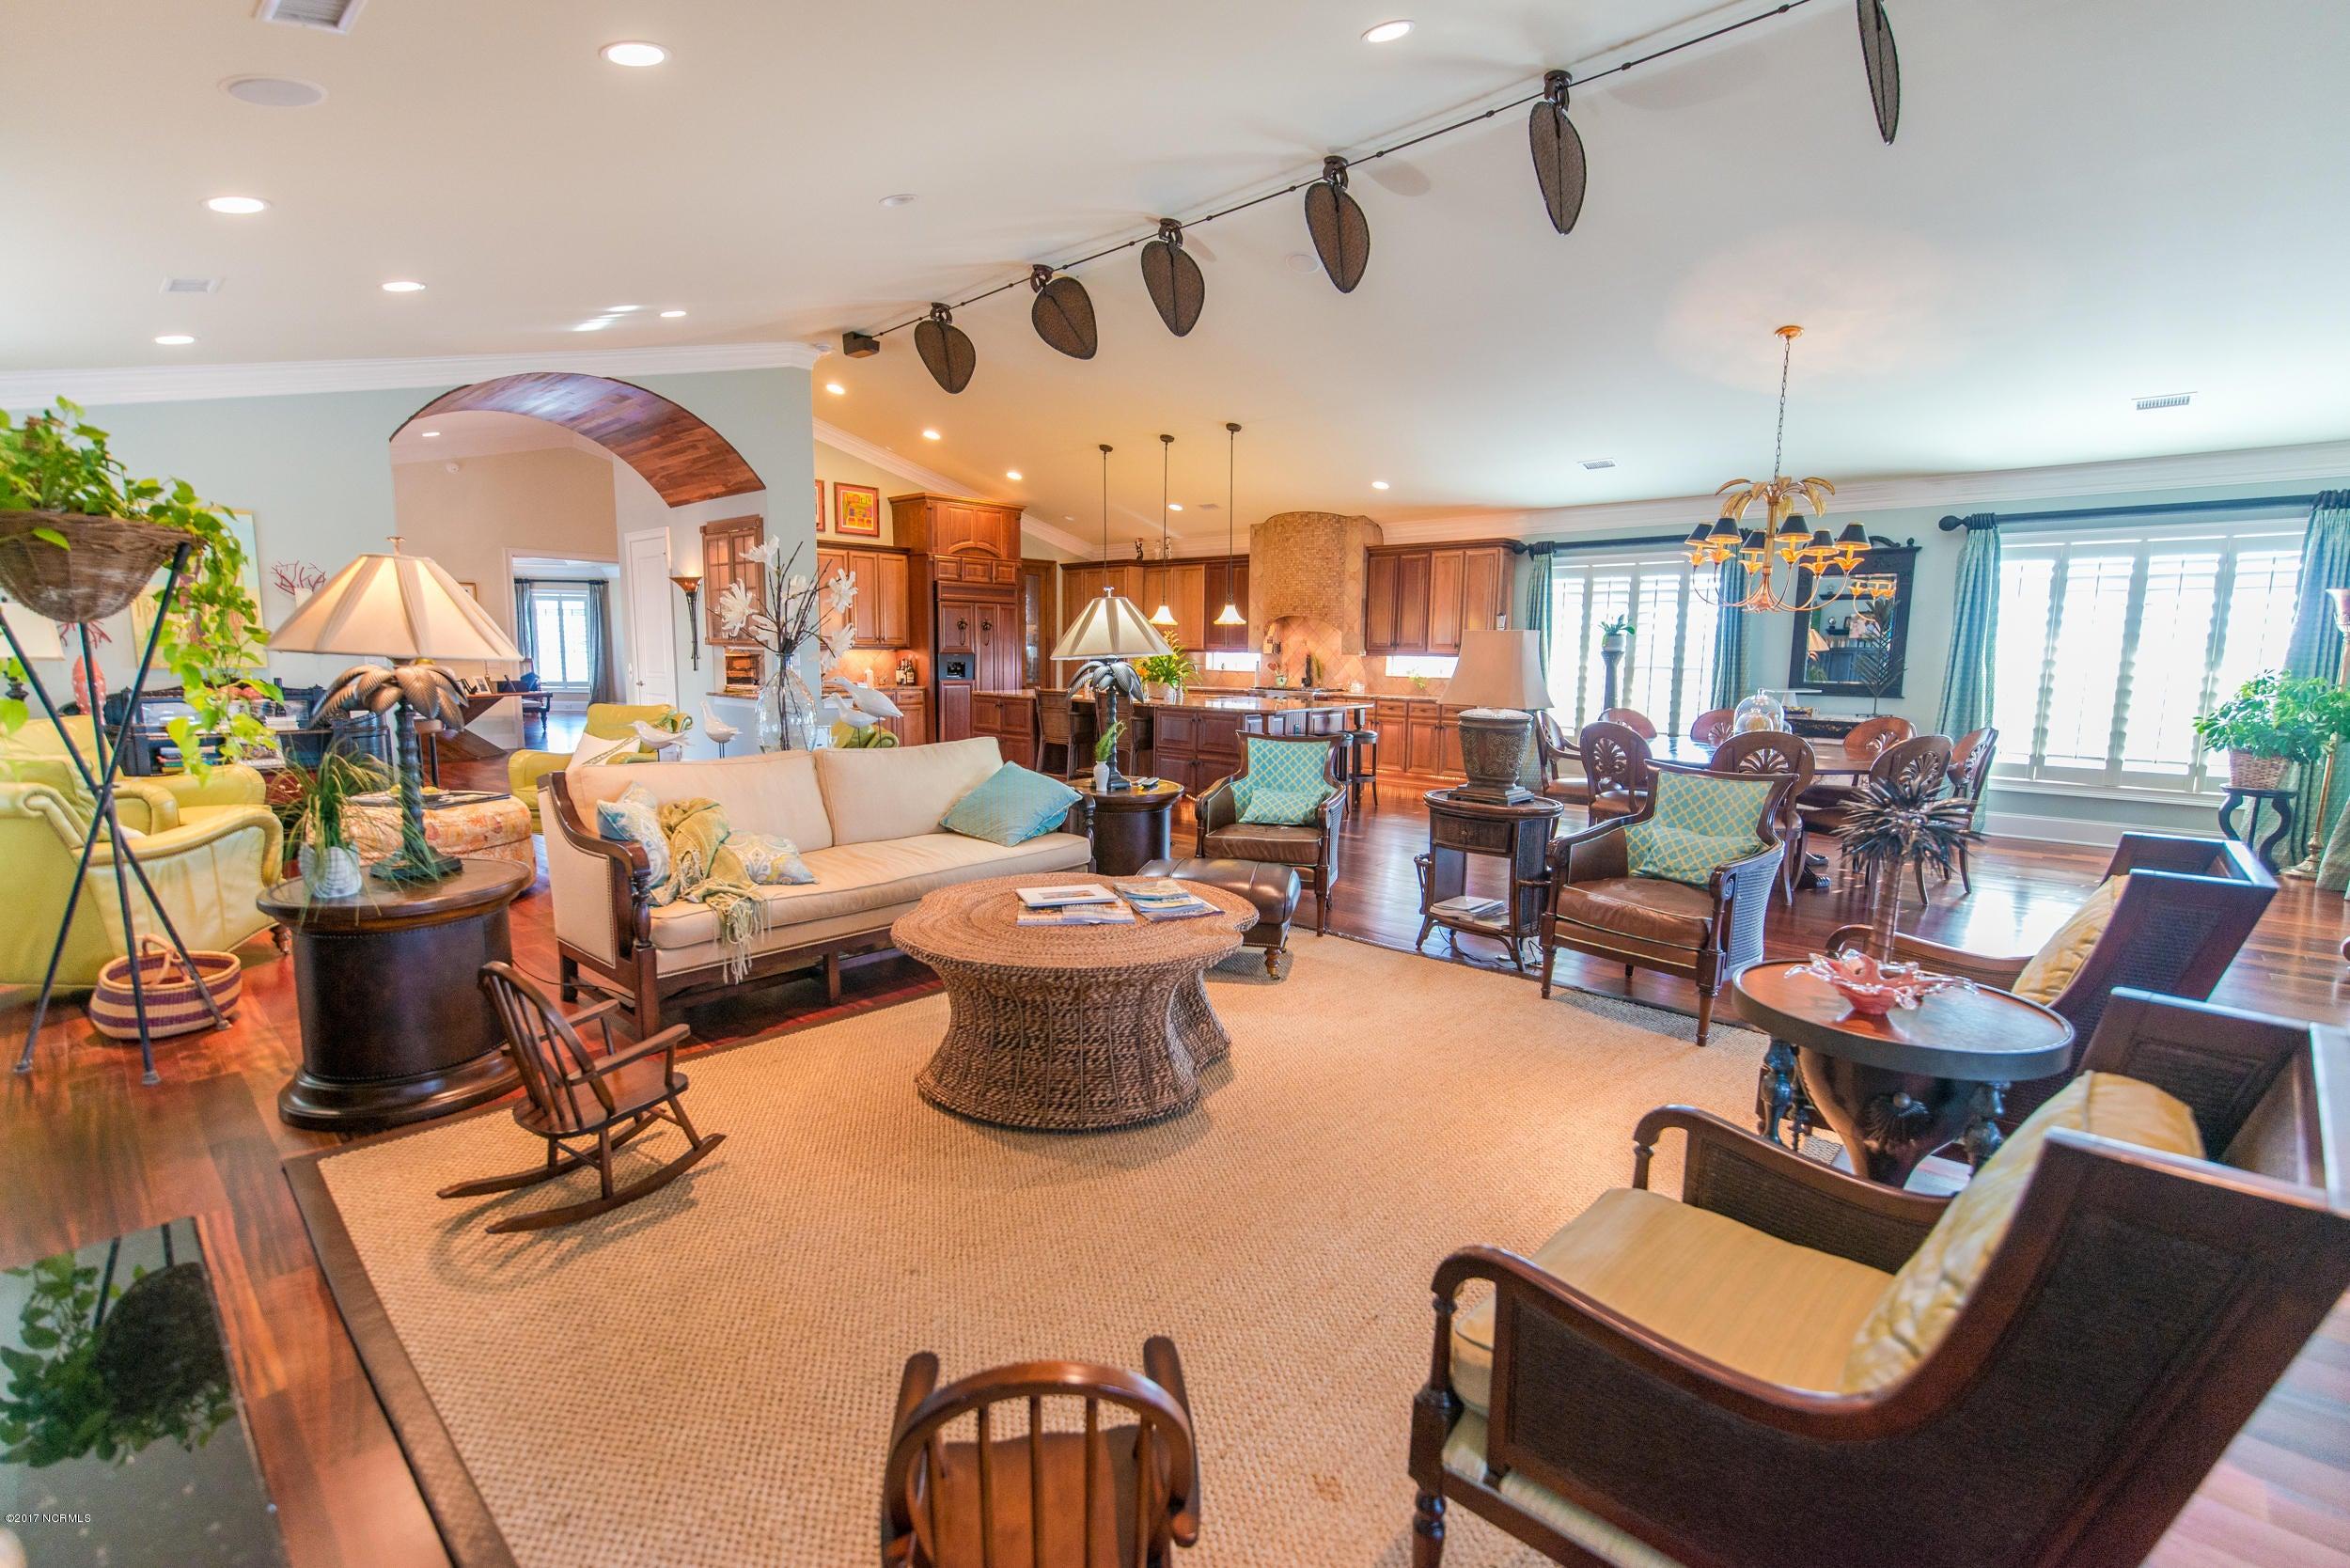 Ocean Isle Beach Real Estate - http://cdn.resize.sparkplatform.com/ncr/1024x768/true/20170829152948470529000000-o.jpg